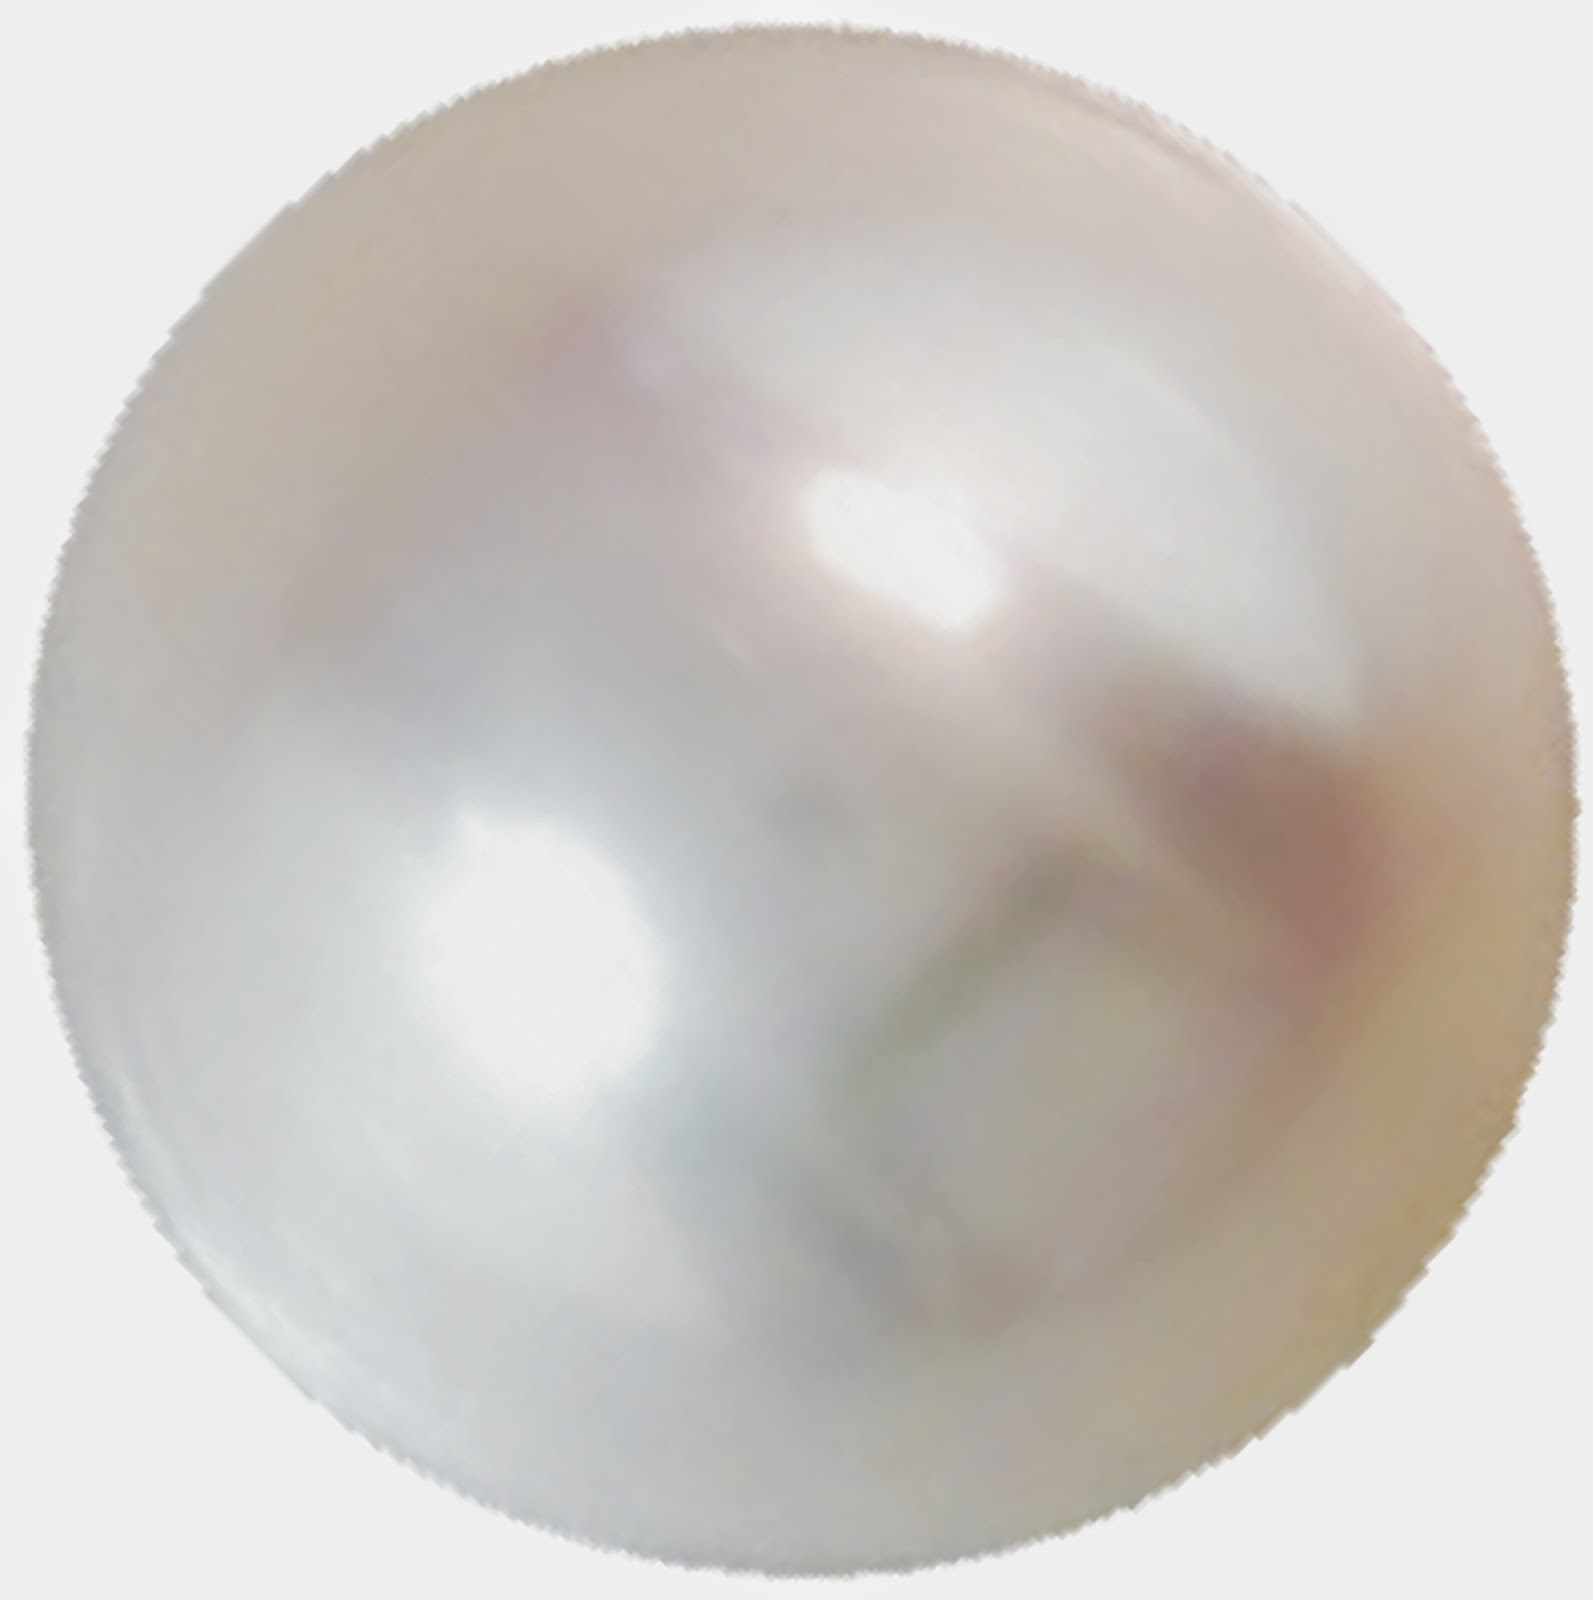 bakthi today pearl gemstone for ring